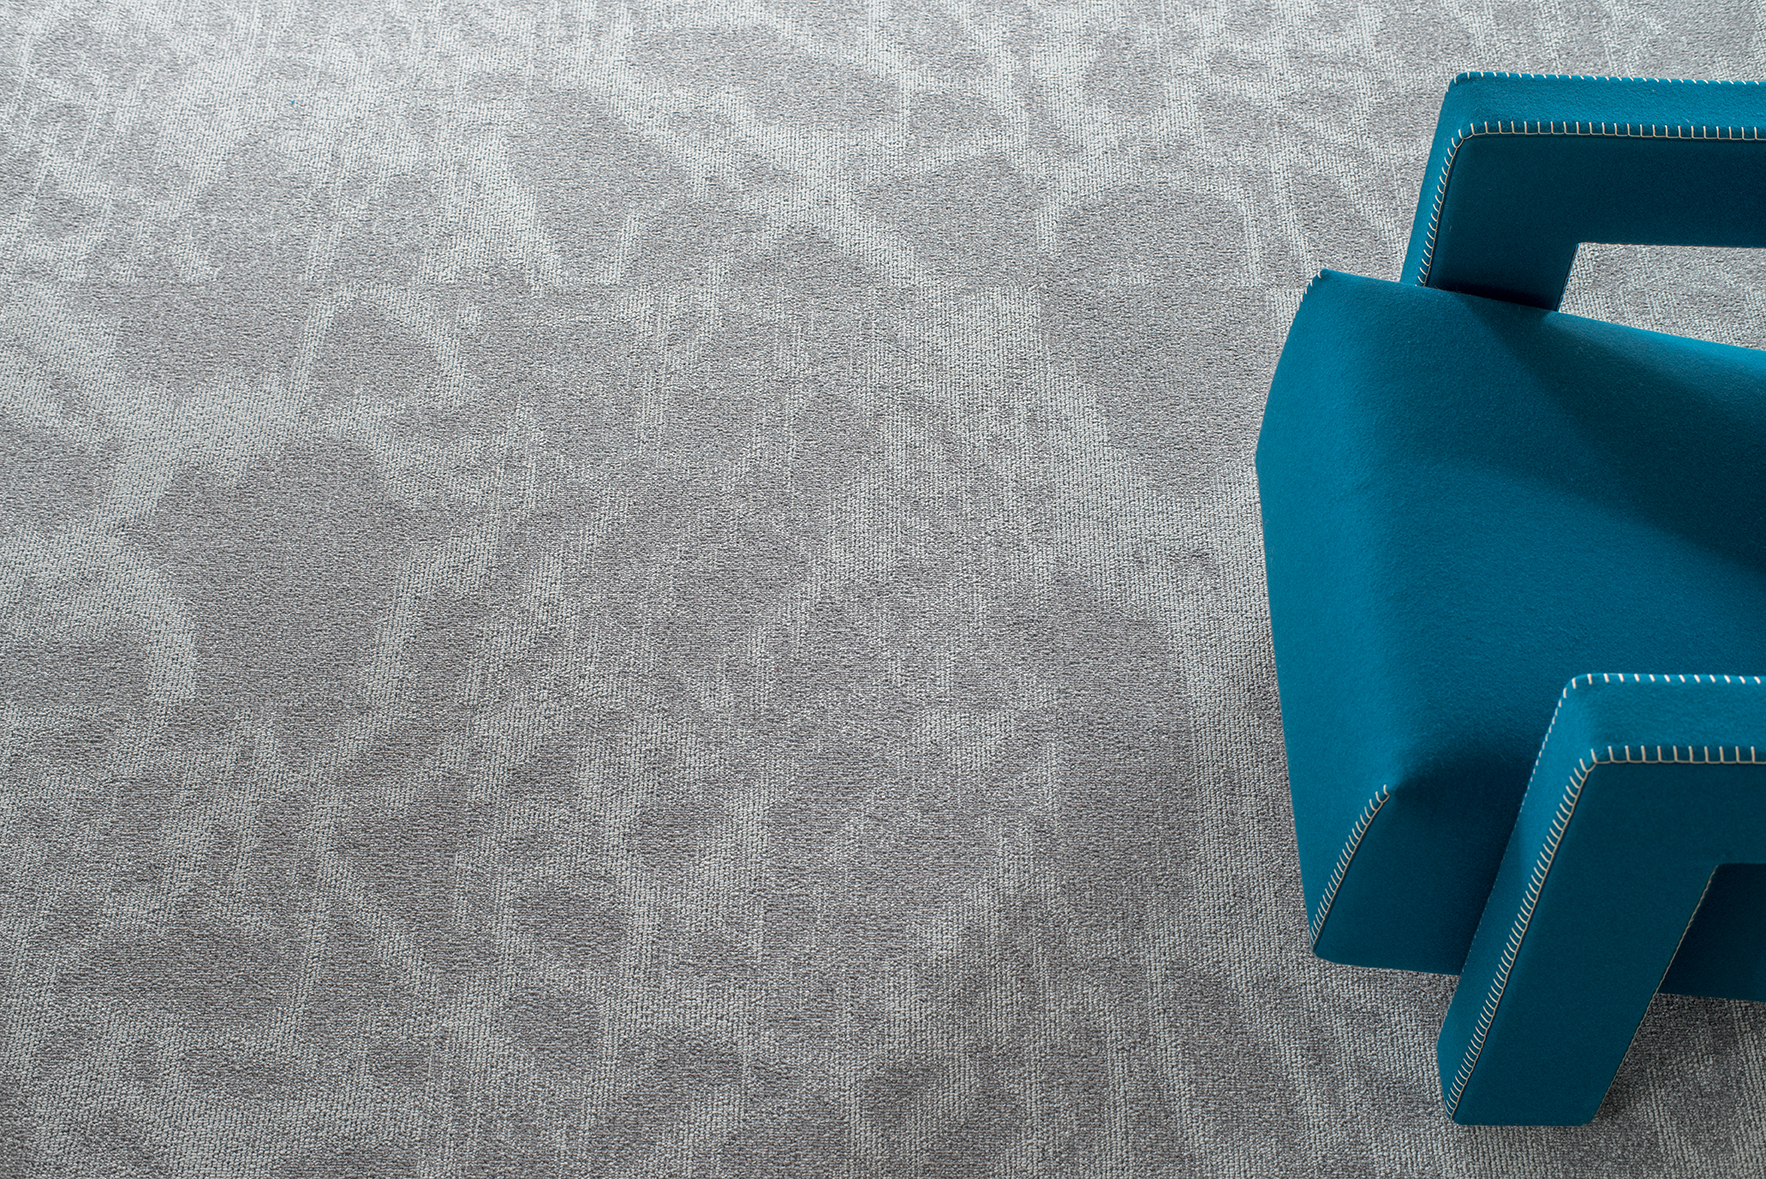 moquette stream moquette anti feu balsan fr. Black Bedroom Furniture Sets. Home Design Ideas